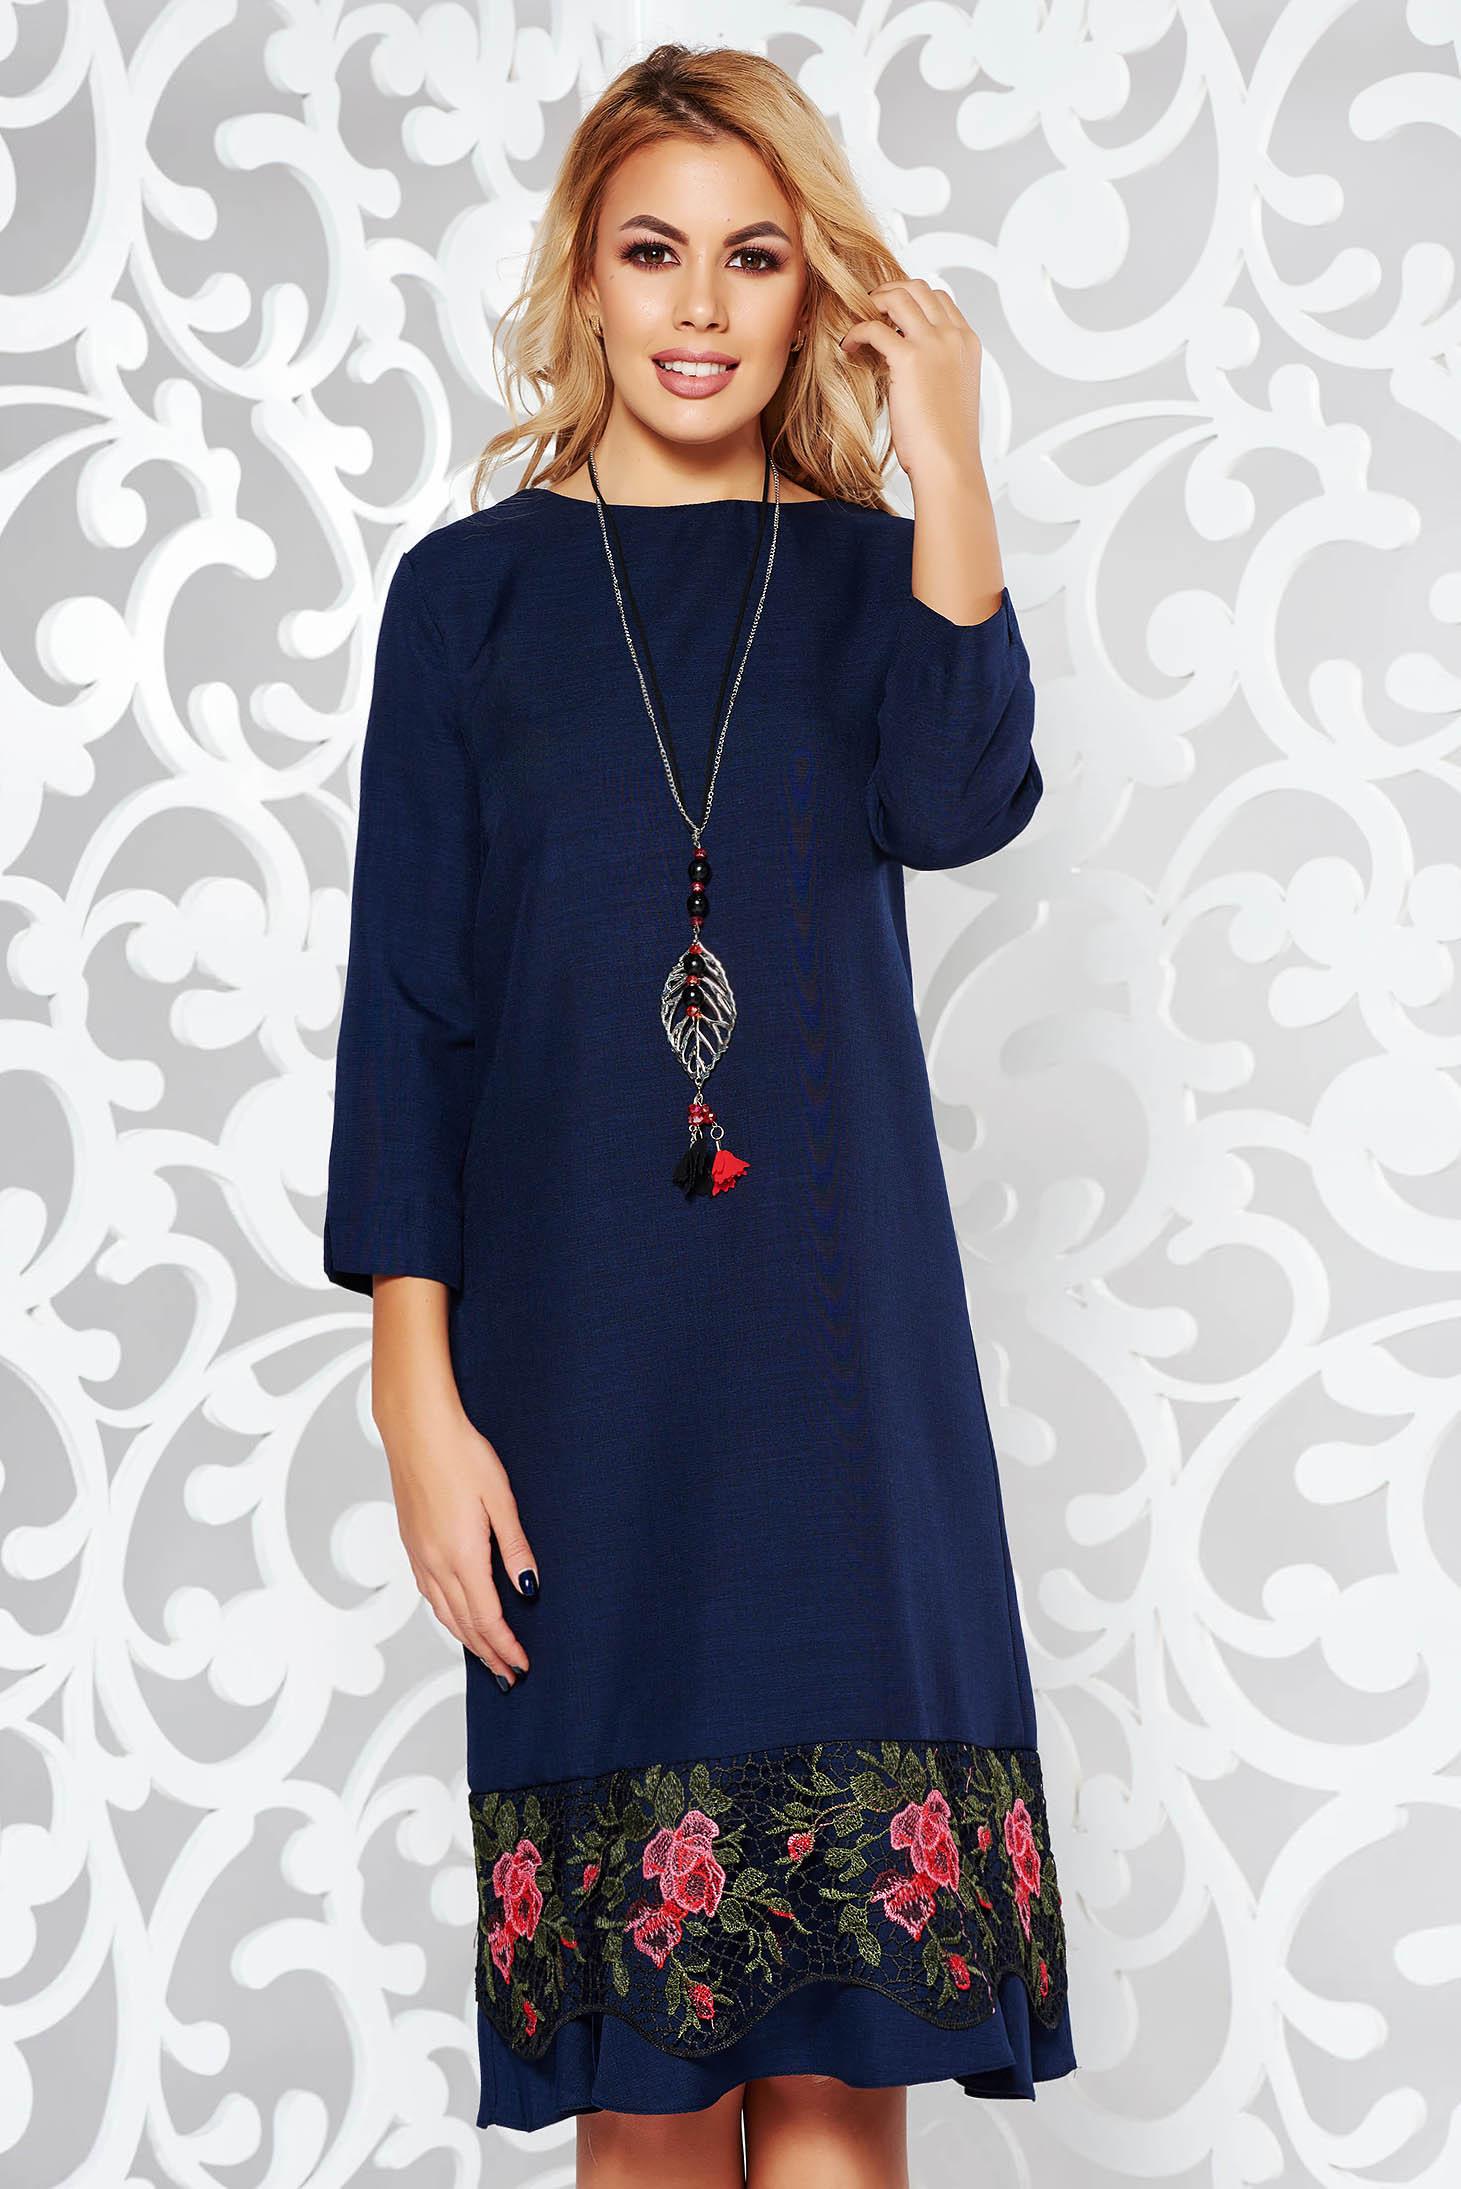 Rochie albastra-inchis eleganta cu croi larg din stofa usor elastica cu aplicatii de dantela accesorizata cu lantisor